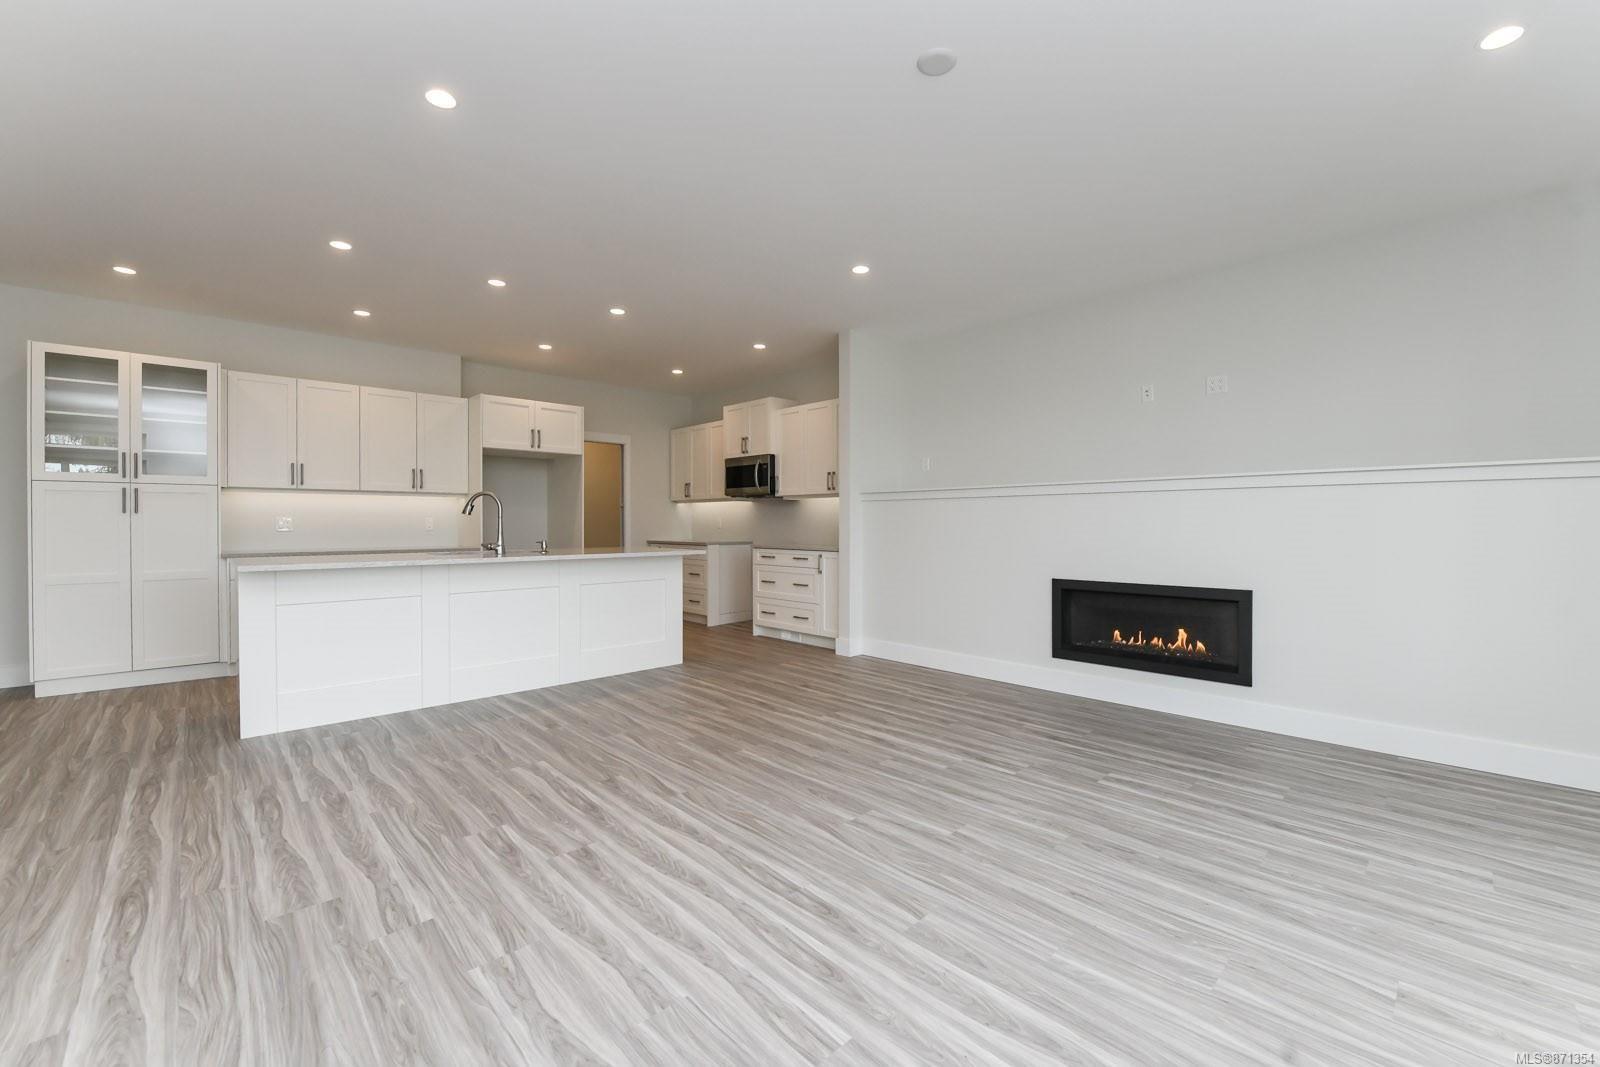 Photo 11: Photos: 68 Grayhawk Pl in : CV Courtenay City House for sale (Comox Valley)  : MLS®# 871354